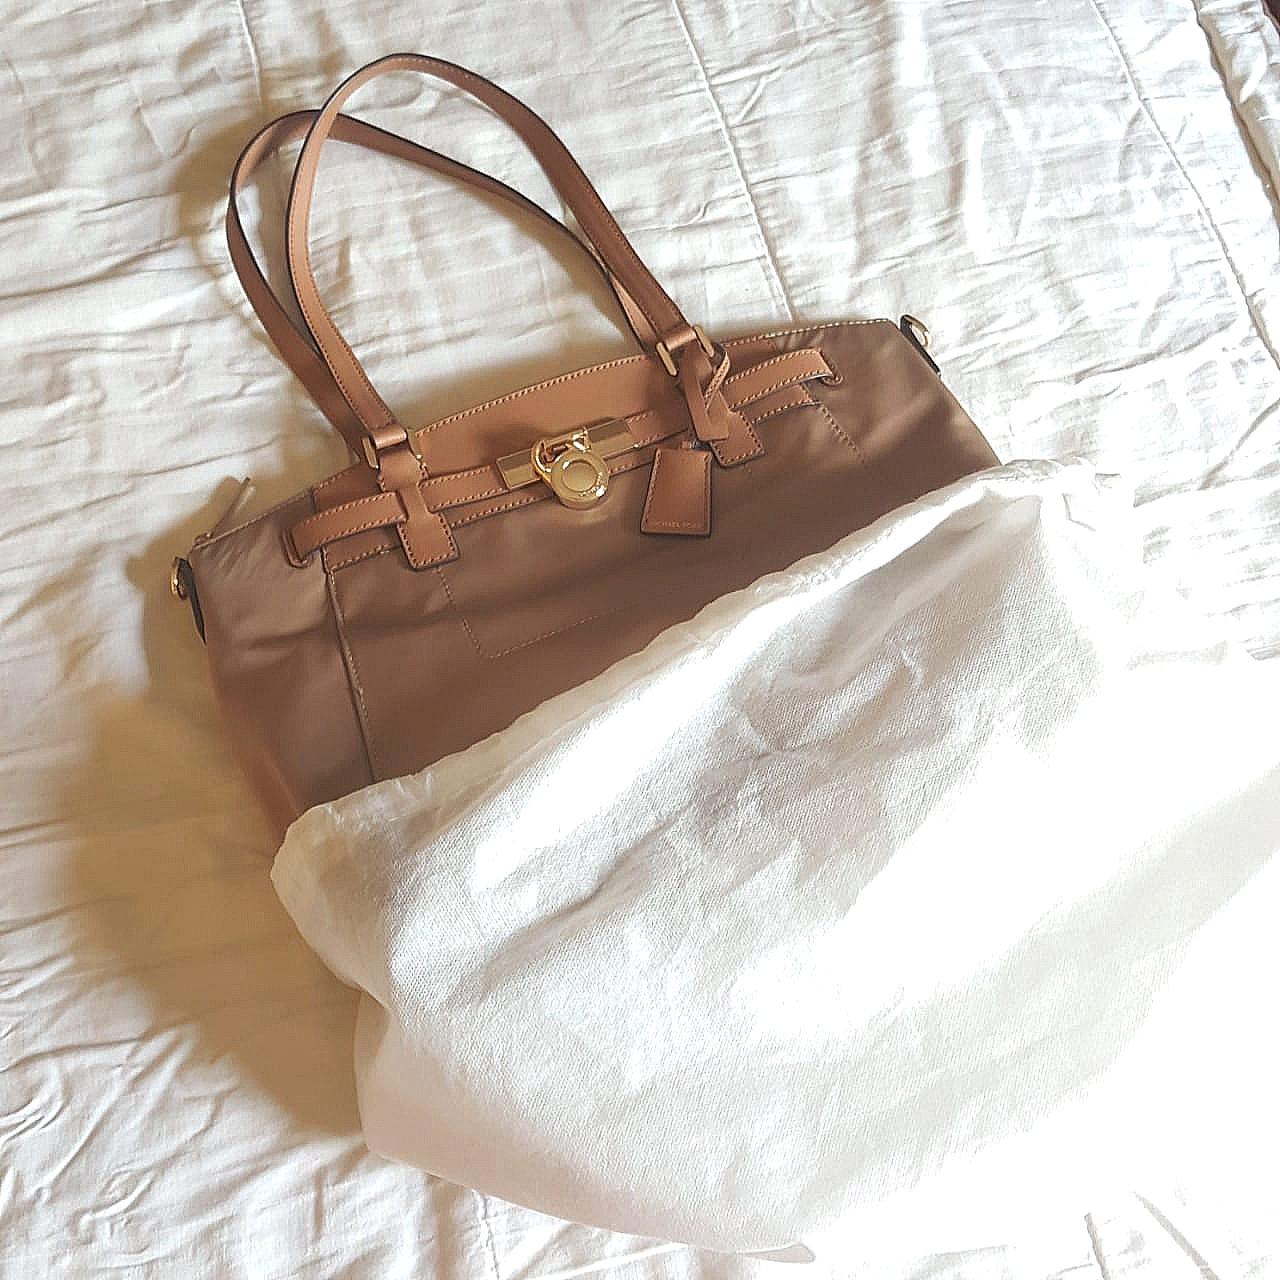 Michael Kors hamilton nylon khaki messenger totebag w/ long strap ORIGINAL FROM STORE (NEW/no stain/no defect)